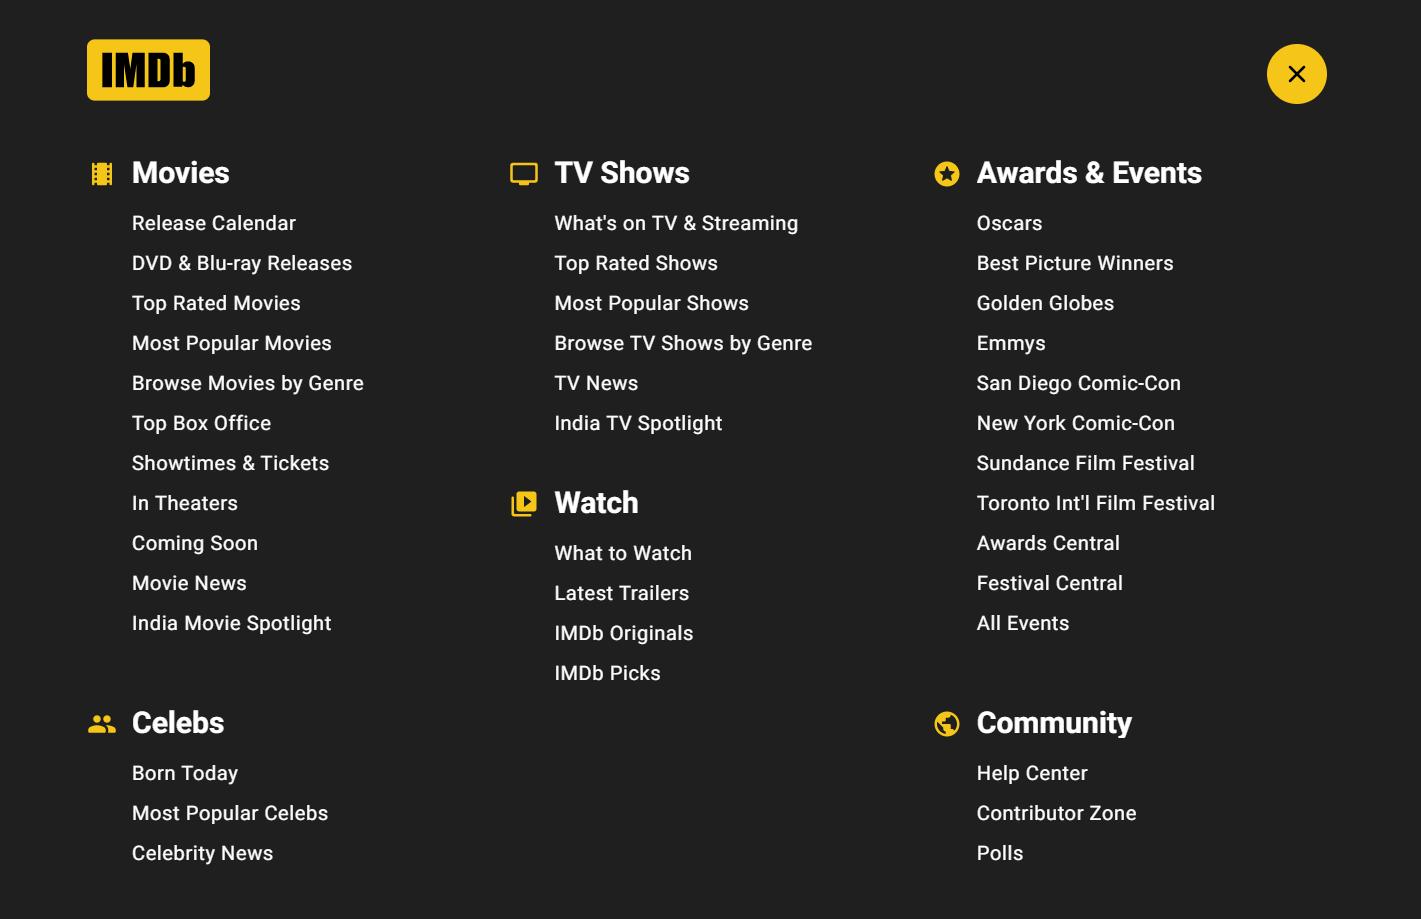 IMDB.com website structure